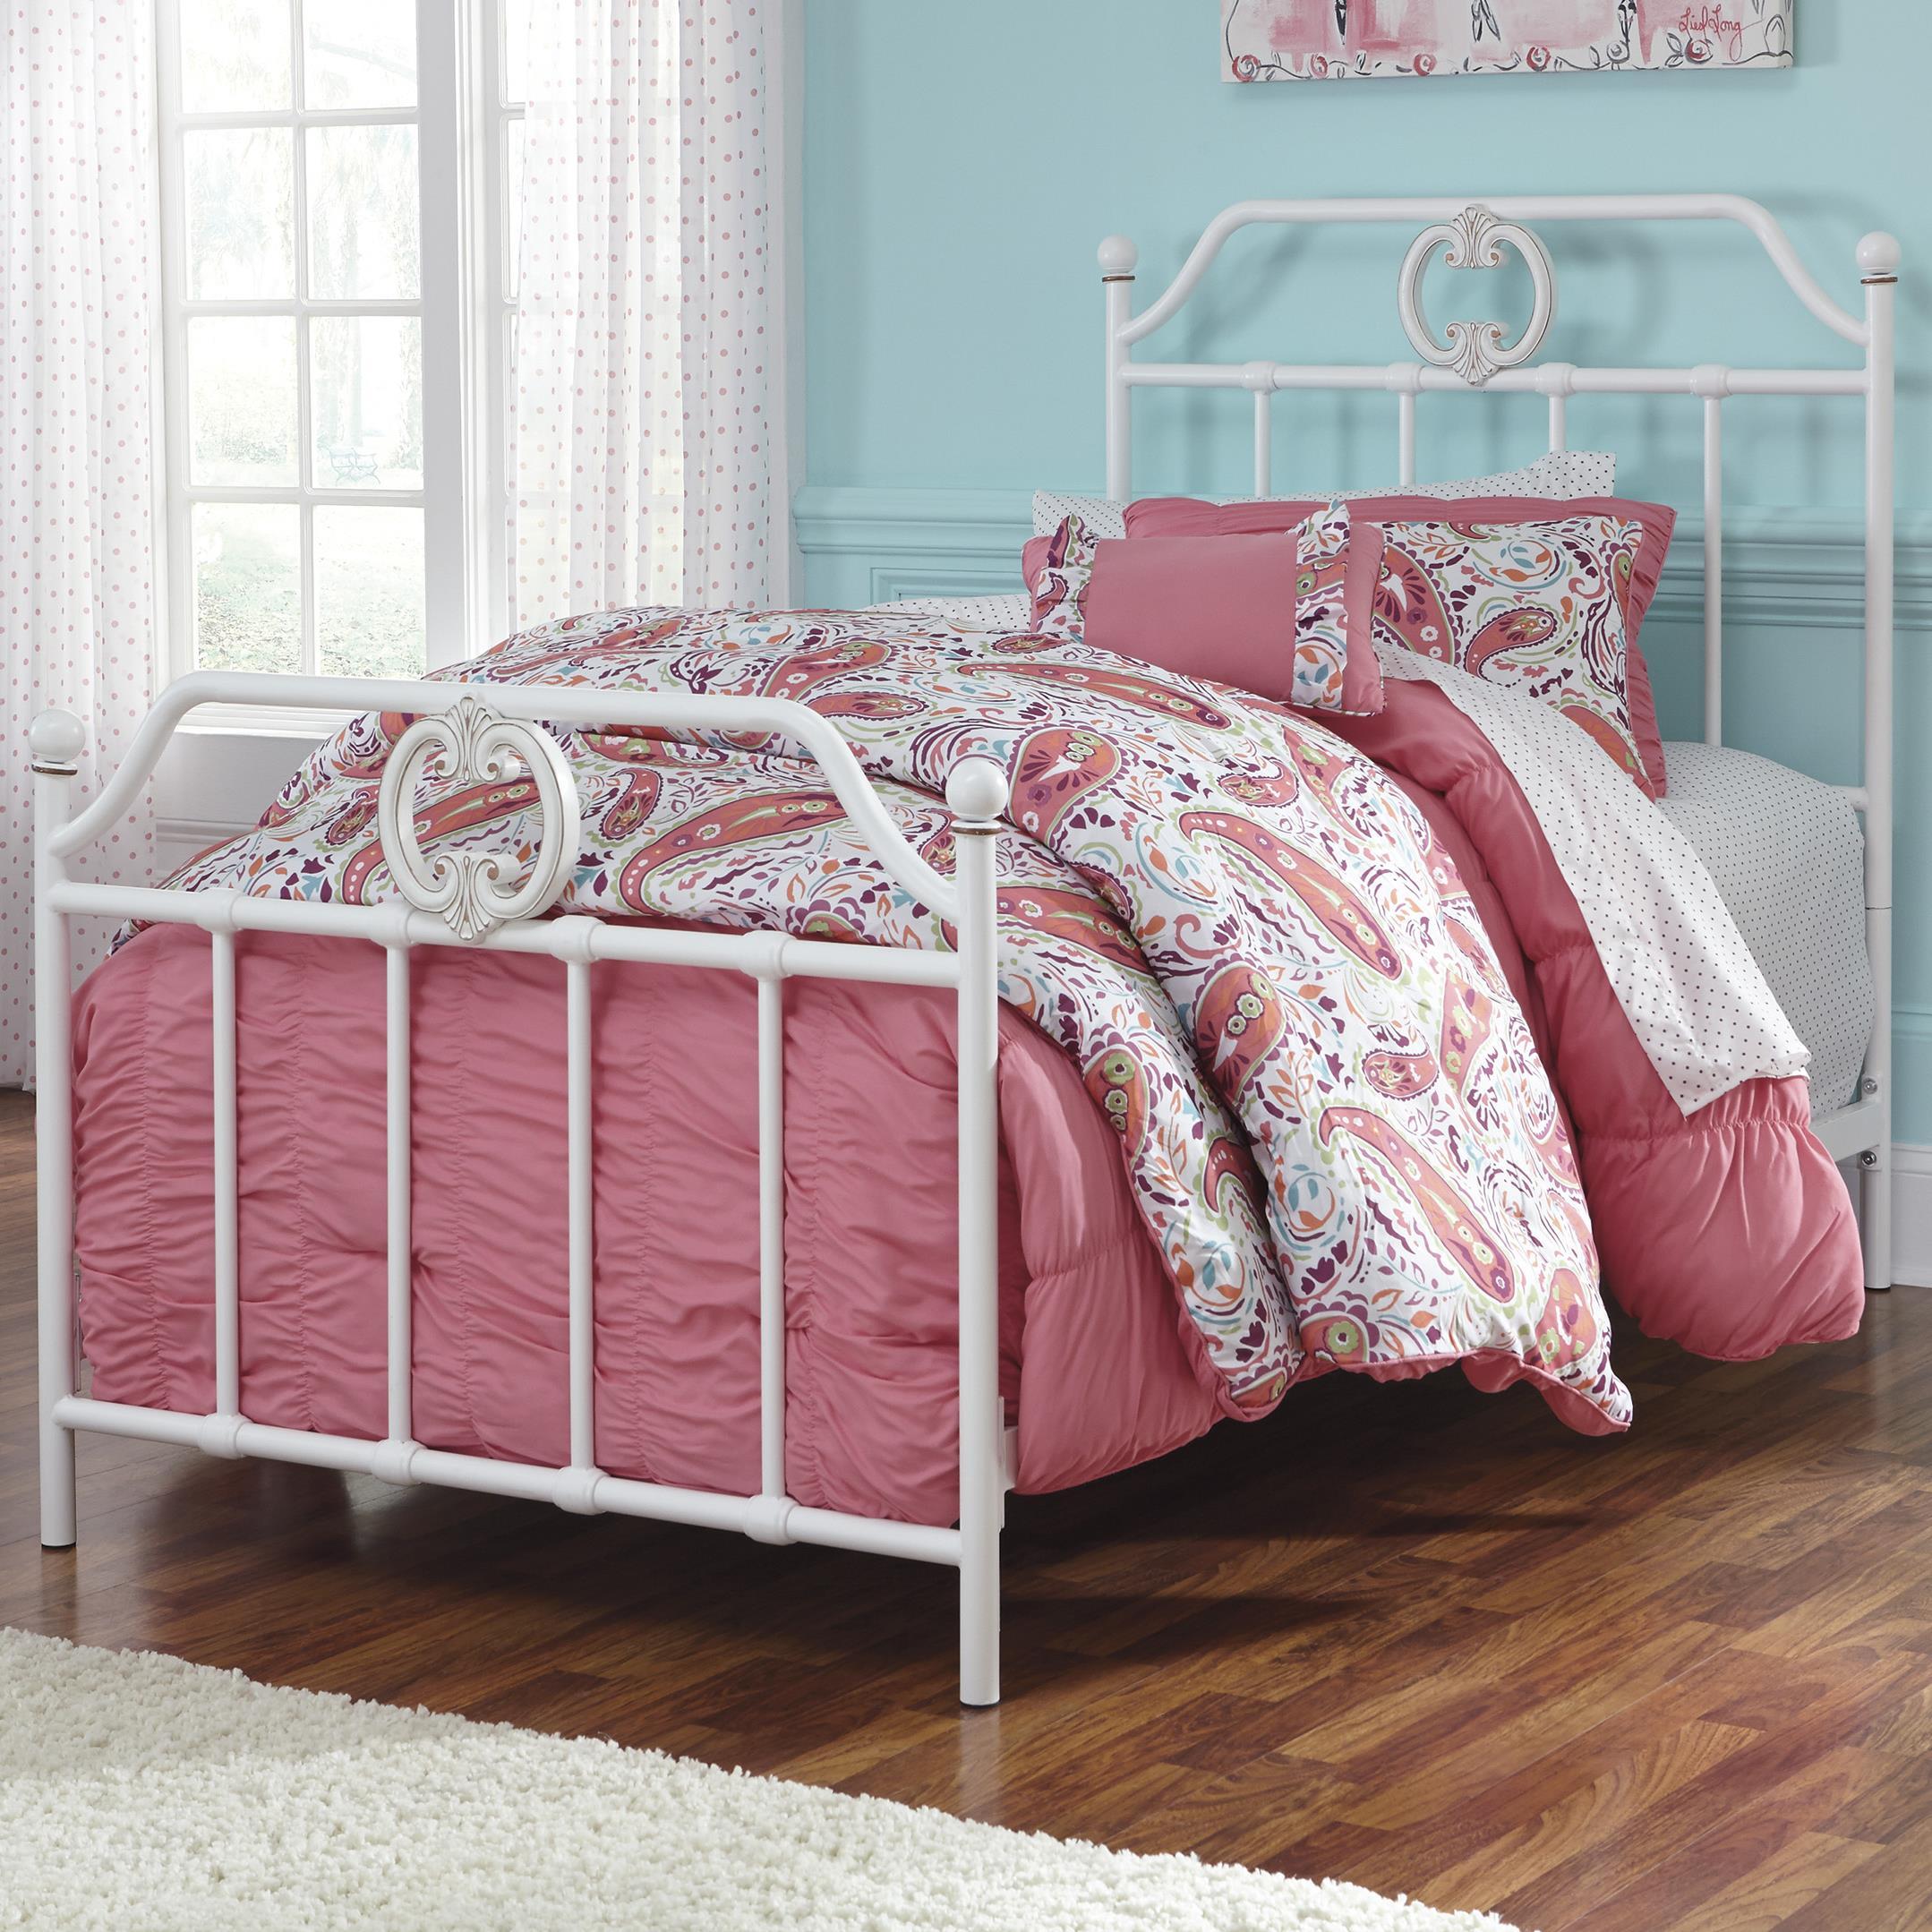 Signature Design by Ashley Korabella Full Metal Bed - Item Number: B355-72